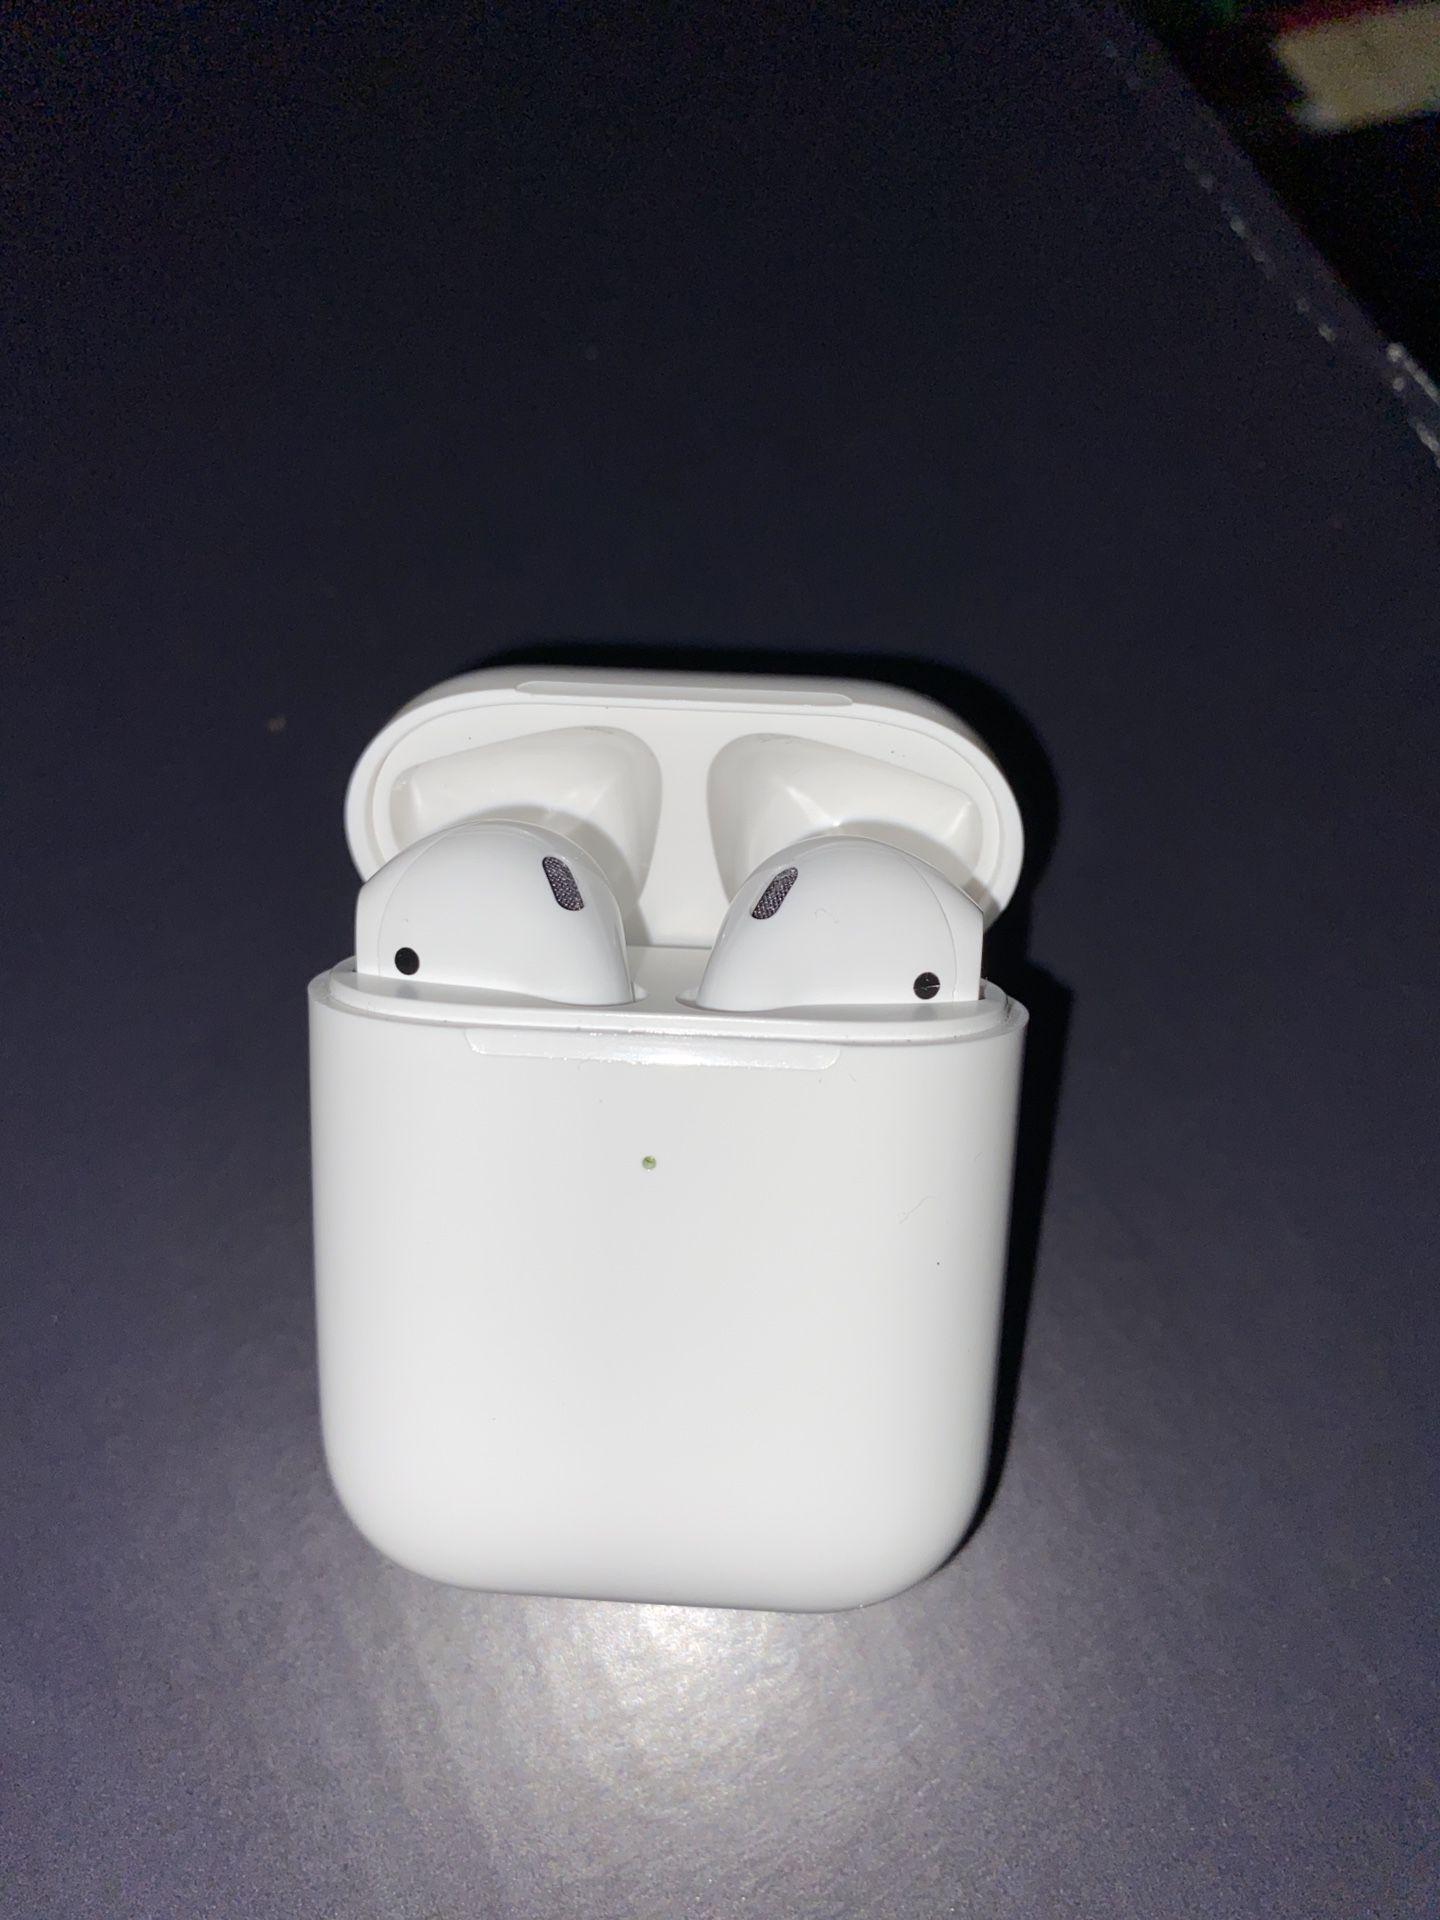 Apple AirPods 2nd Gen w/ Wireless Charging Case & Free Grips❕